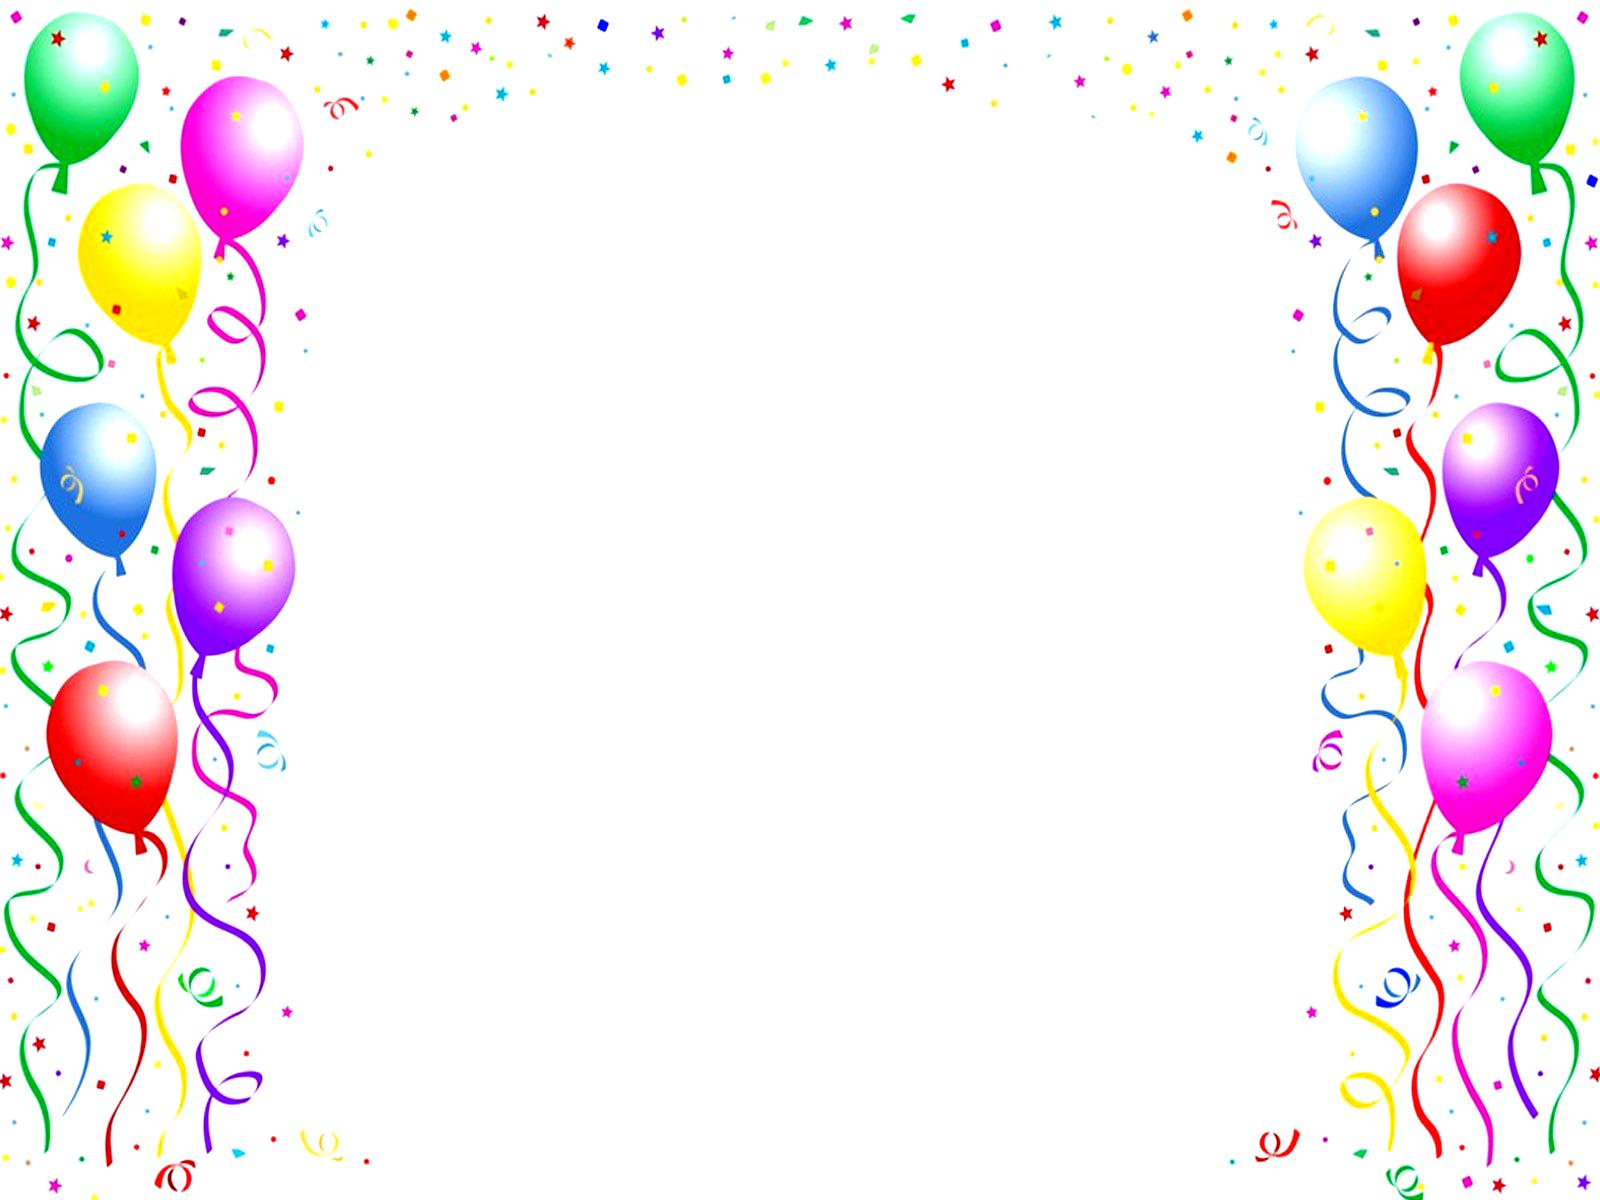 Birthday borders free download best birthday borders on clipartmag 1600x1200 birthday template bookmarktalkfo Choice Image